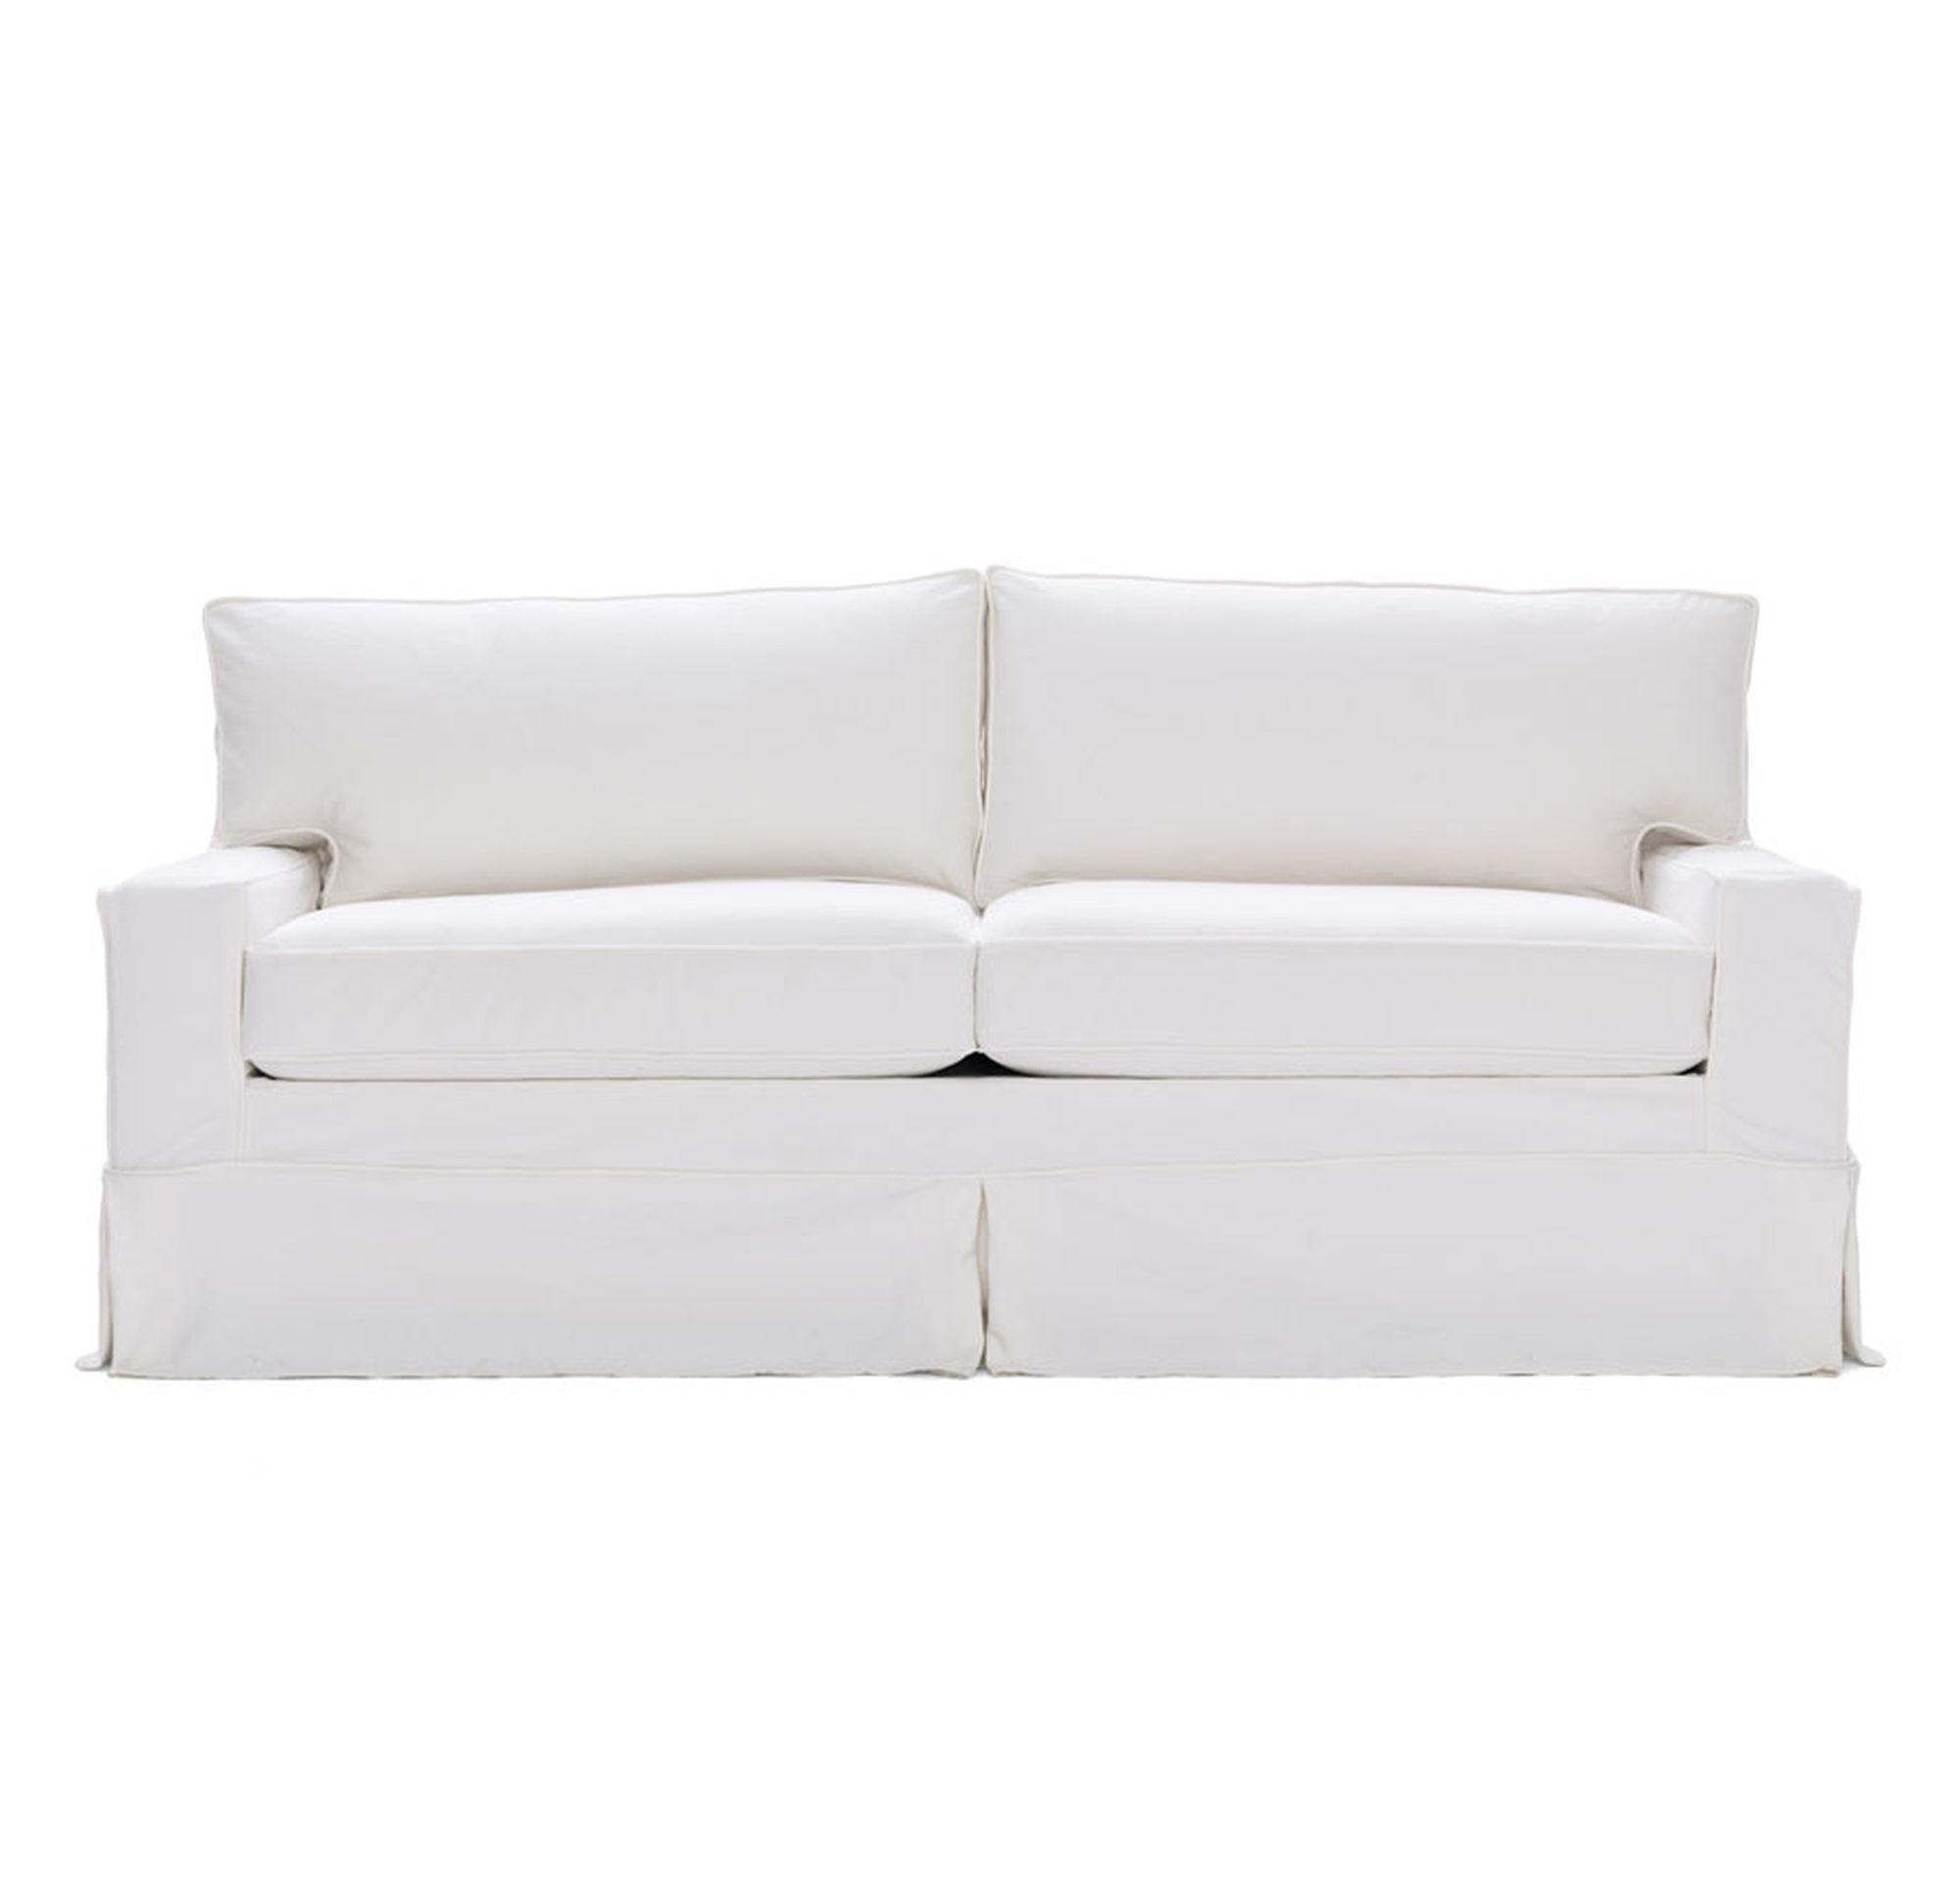 queen size sleeper sofa slipcover